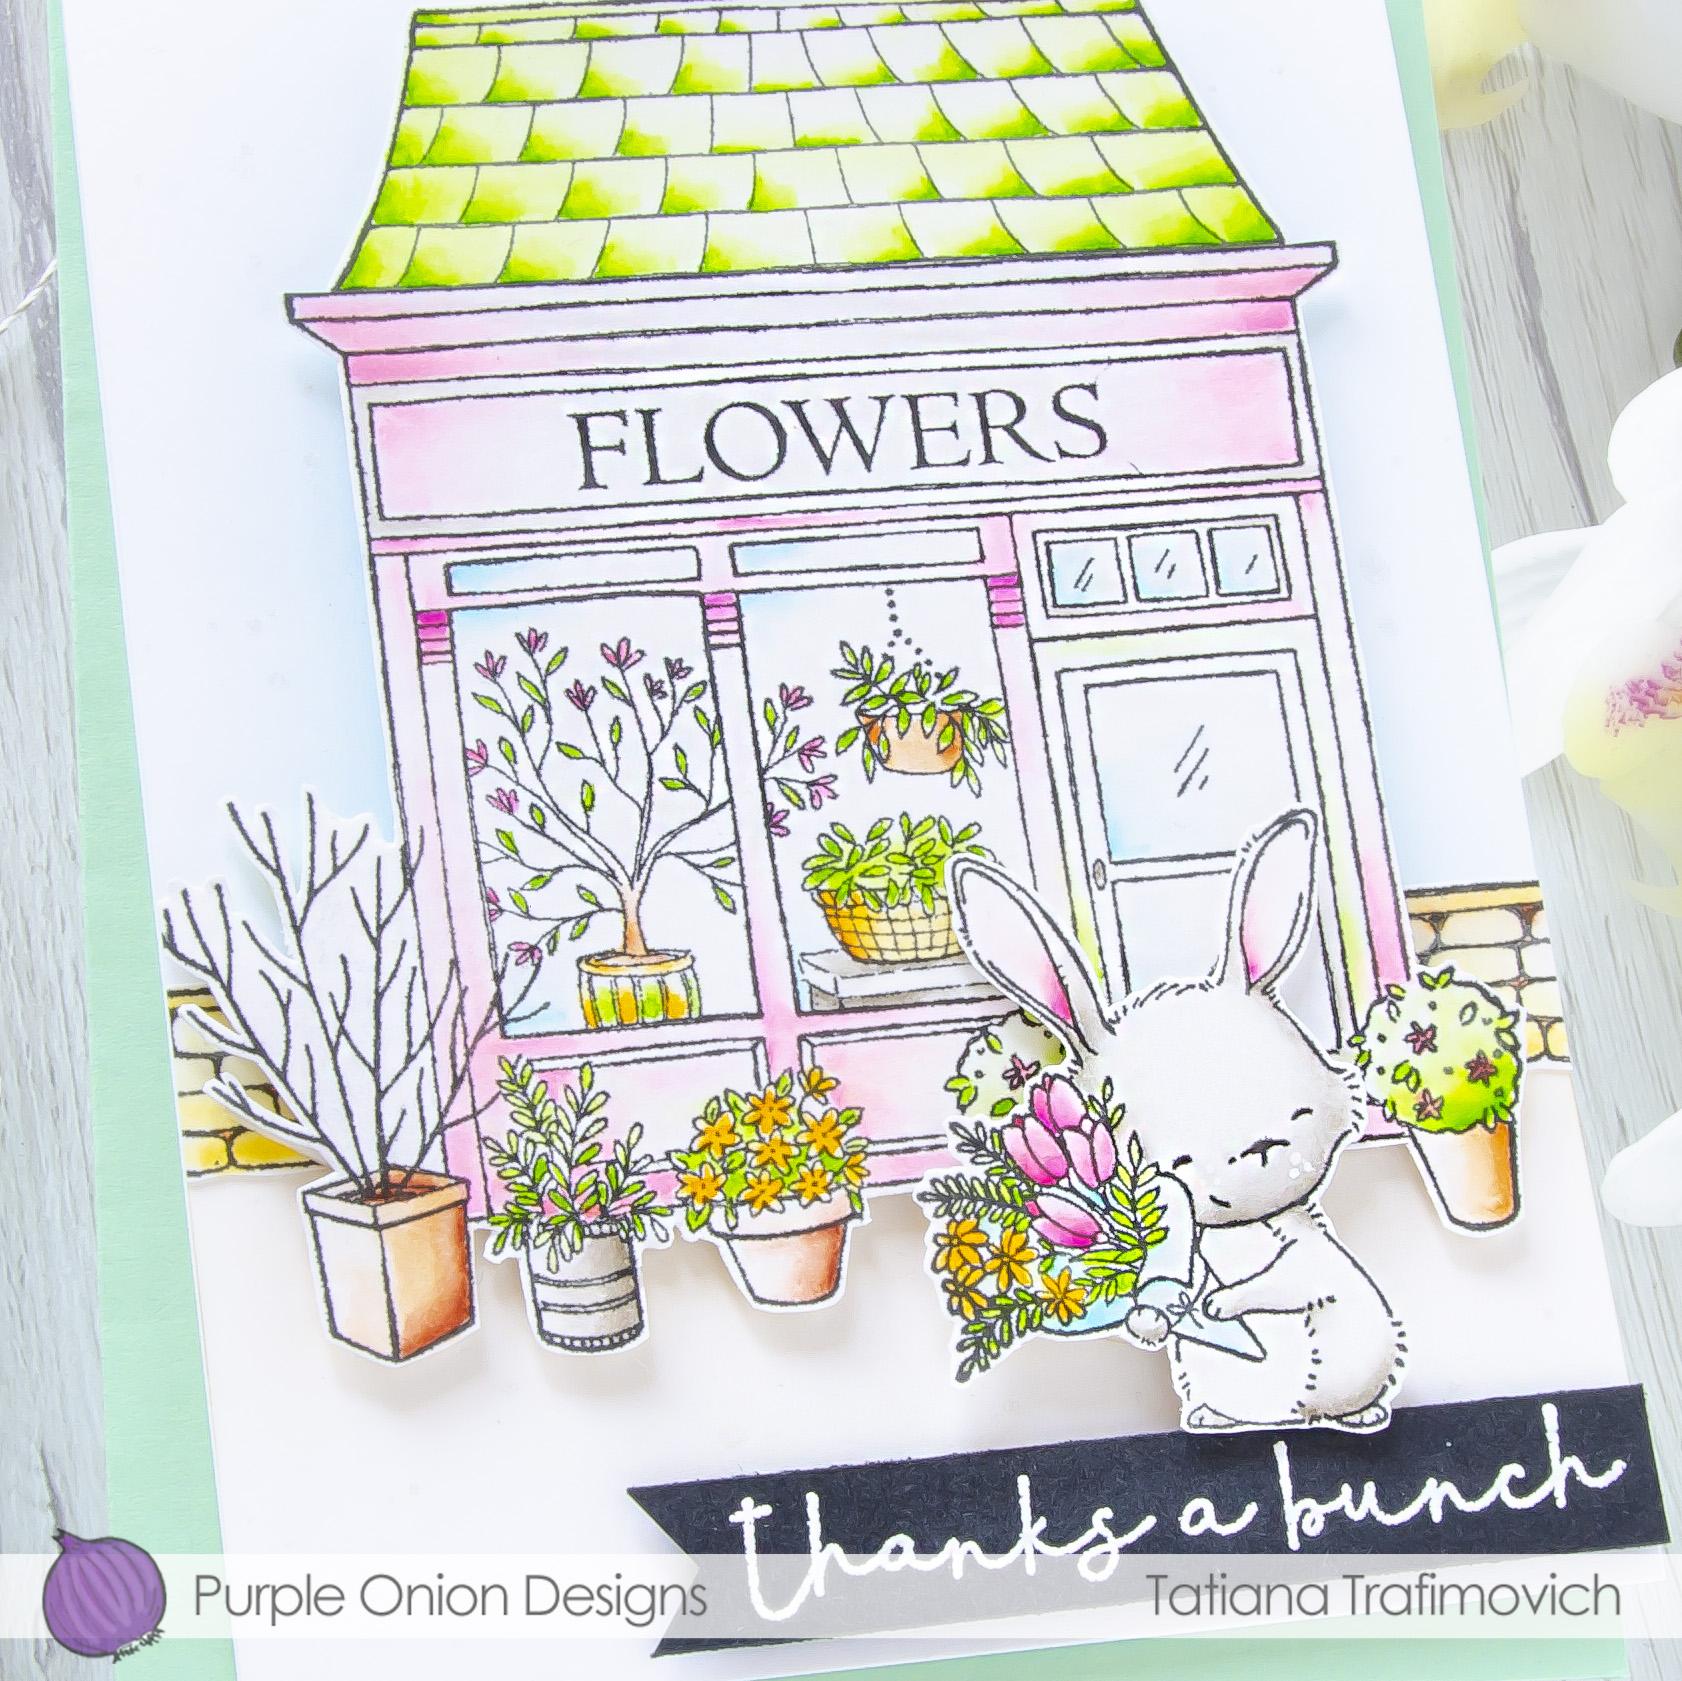 Thanks A Bunch #handmade card by Tatiana Trafimovich #tatianacraftandart - stamps by Purple Onion Designs